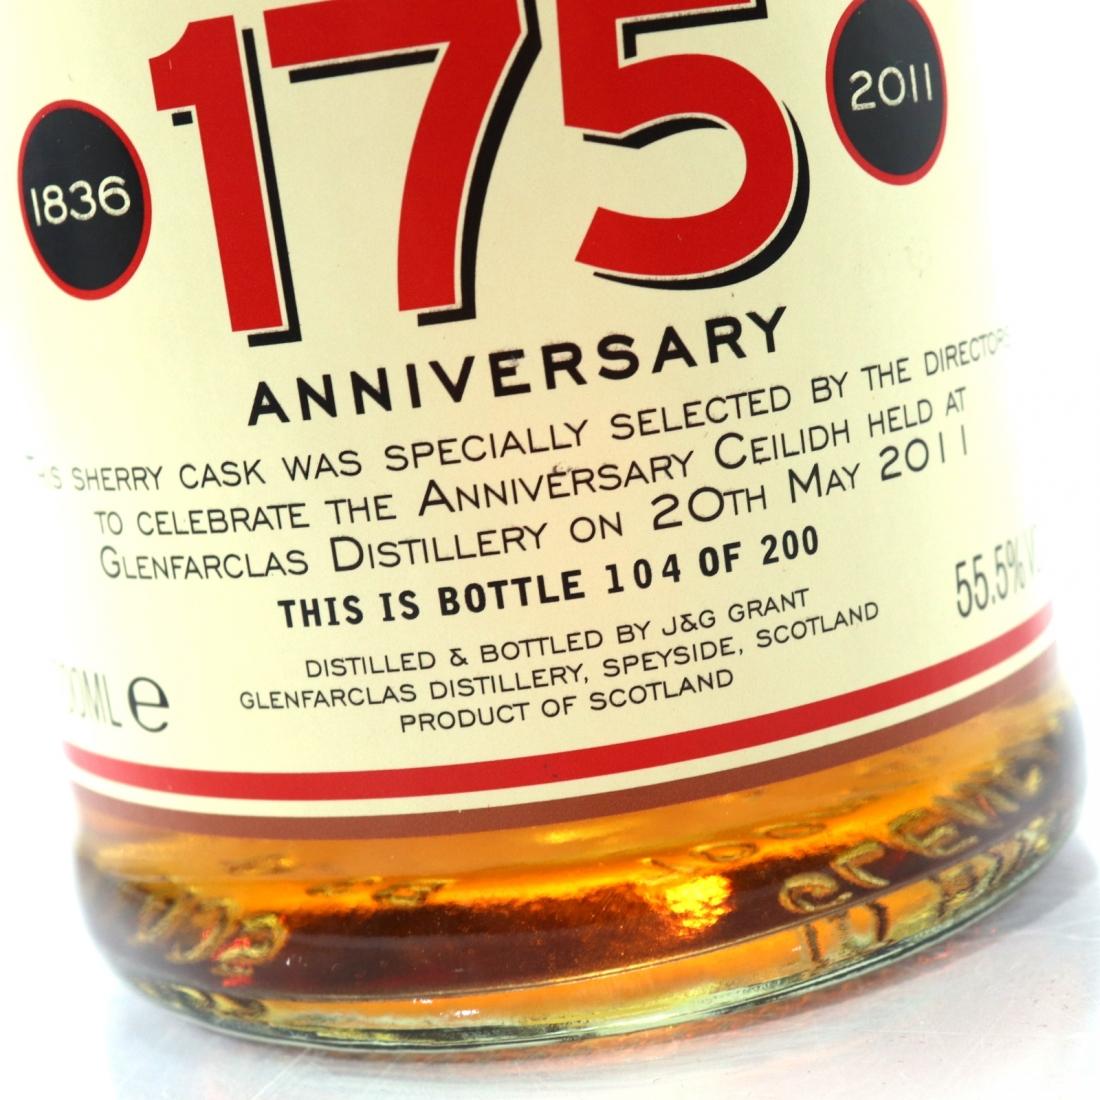 Glenfarclas Single Cask / 175th Anniversary Ceilidh